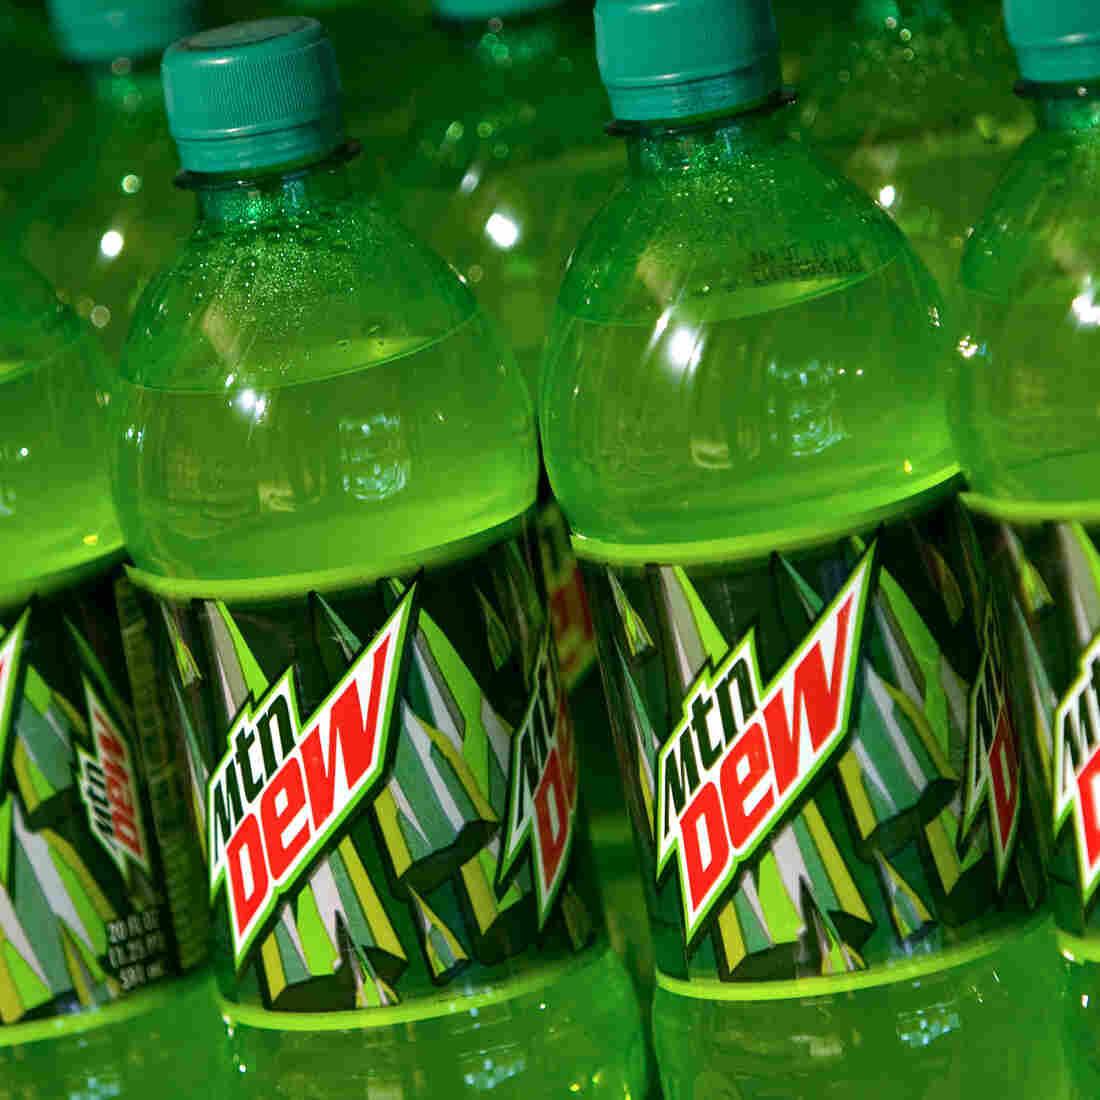 'Mountain Dew Mouth' Is Destroying Appalachia's Teeth, Critics Say